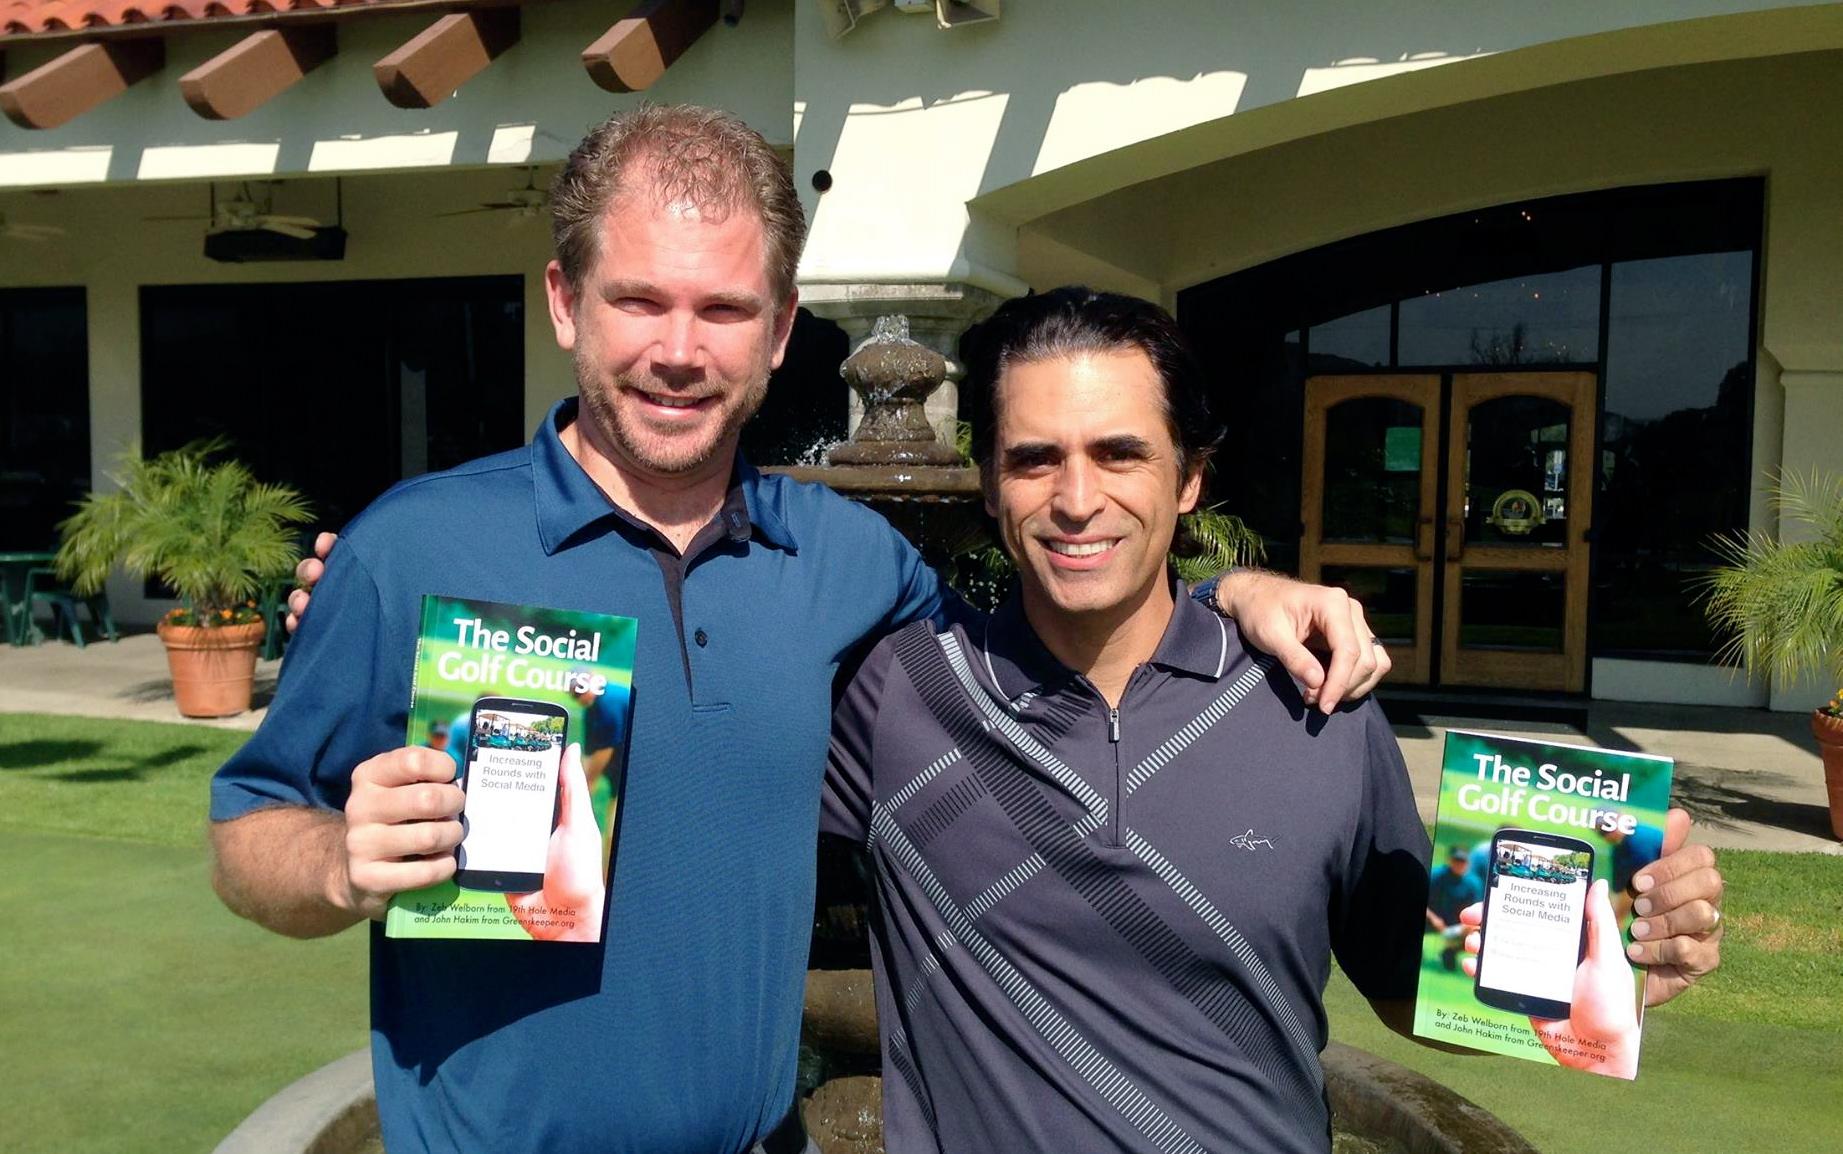 Book Launch Zeb Welborn and John Hakim